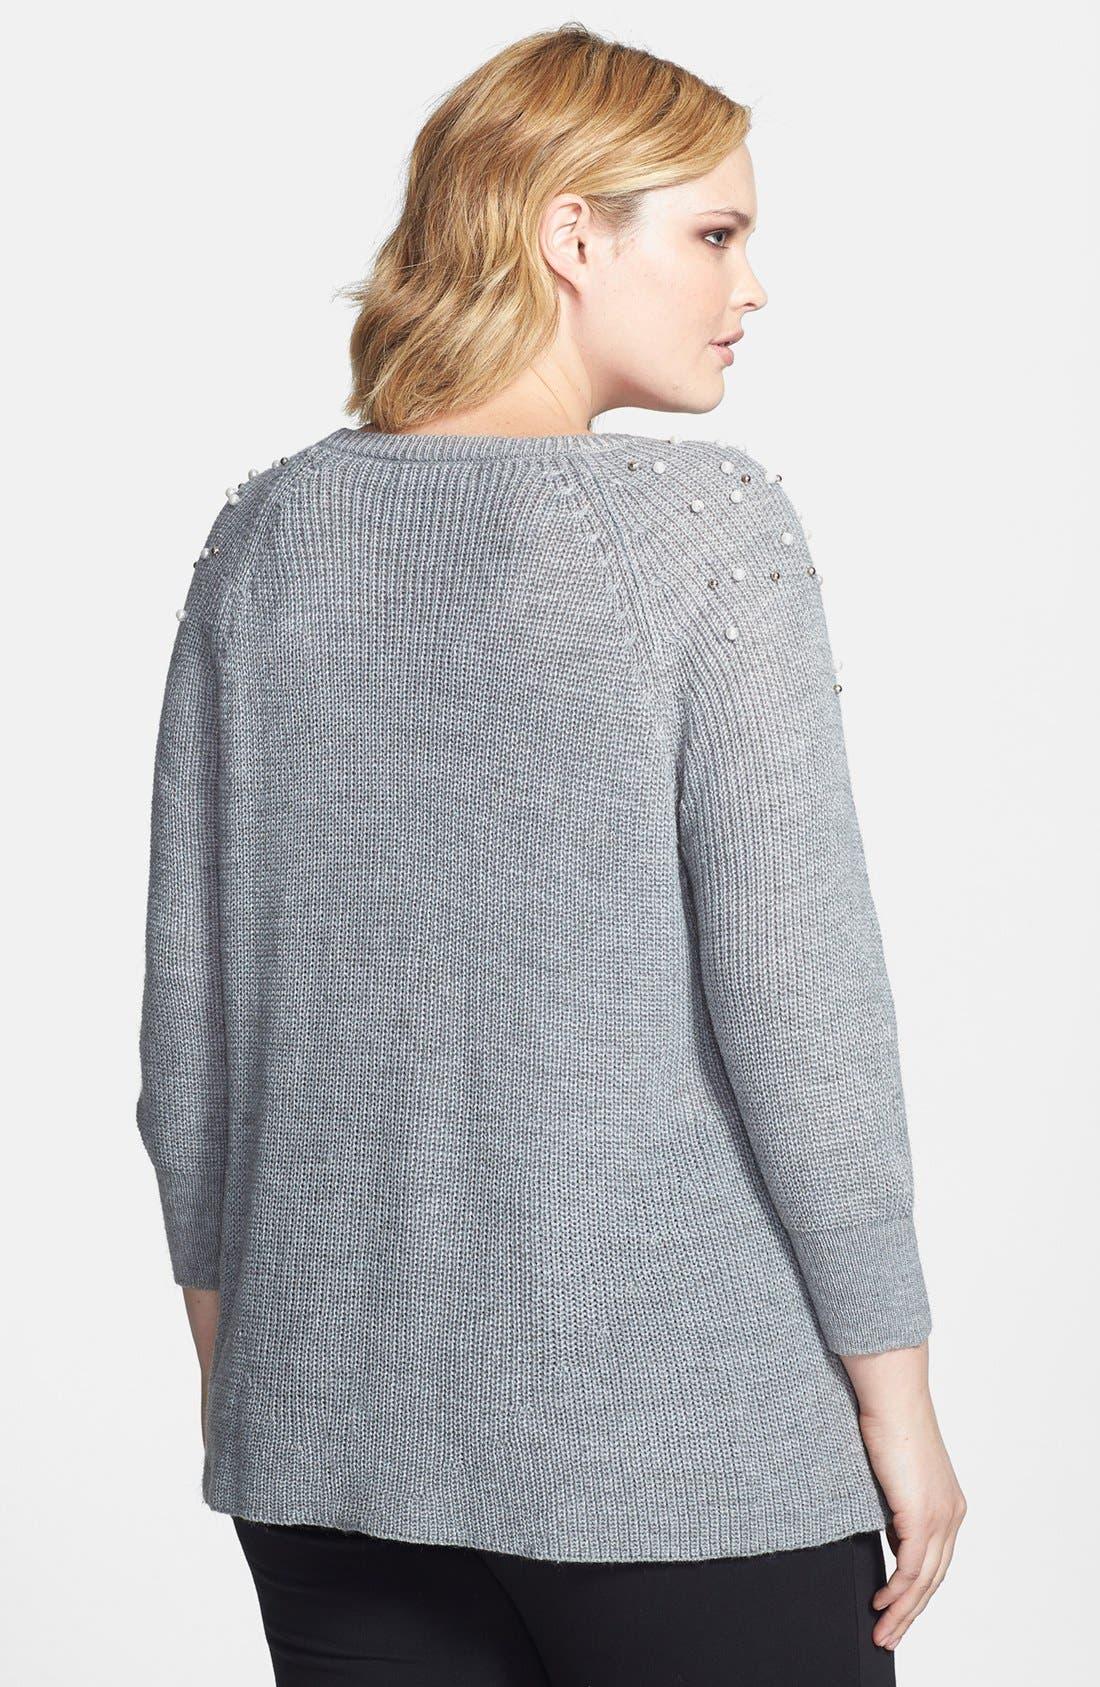 Alternate Image 2  - Jessica Simpson 'Eiffel' Embellished Sweater (Plus Size)